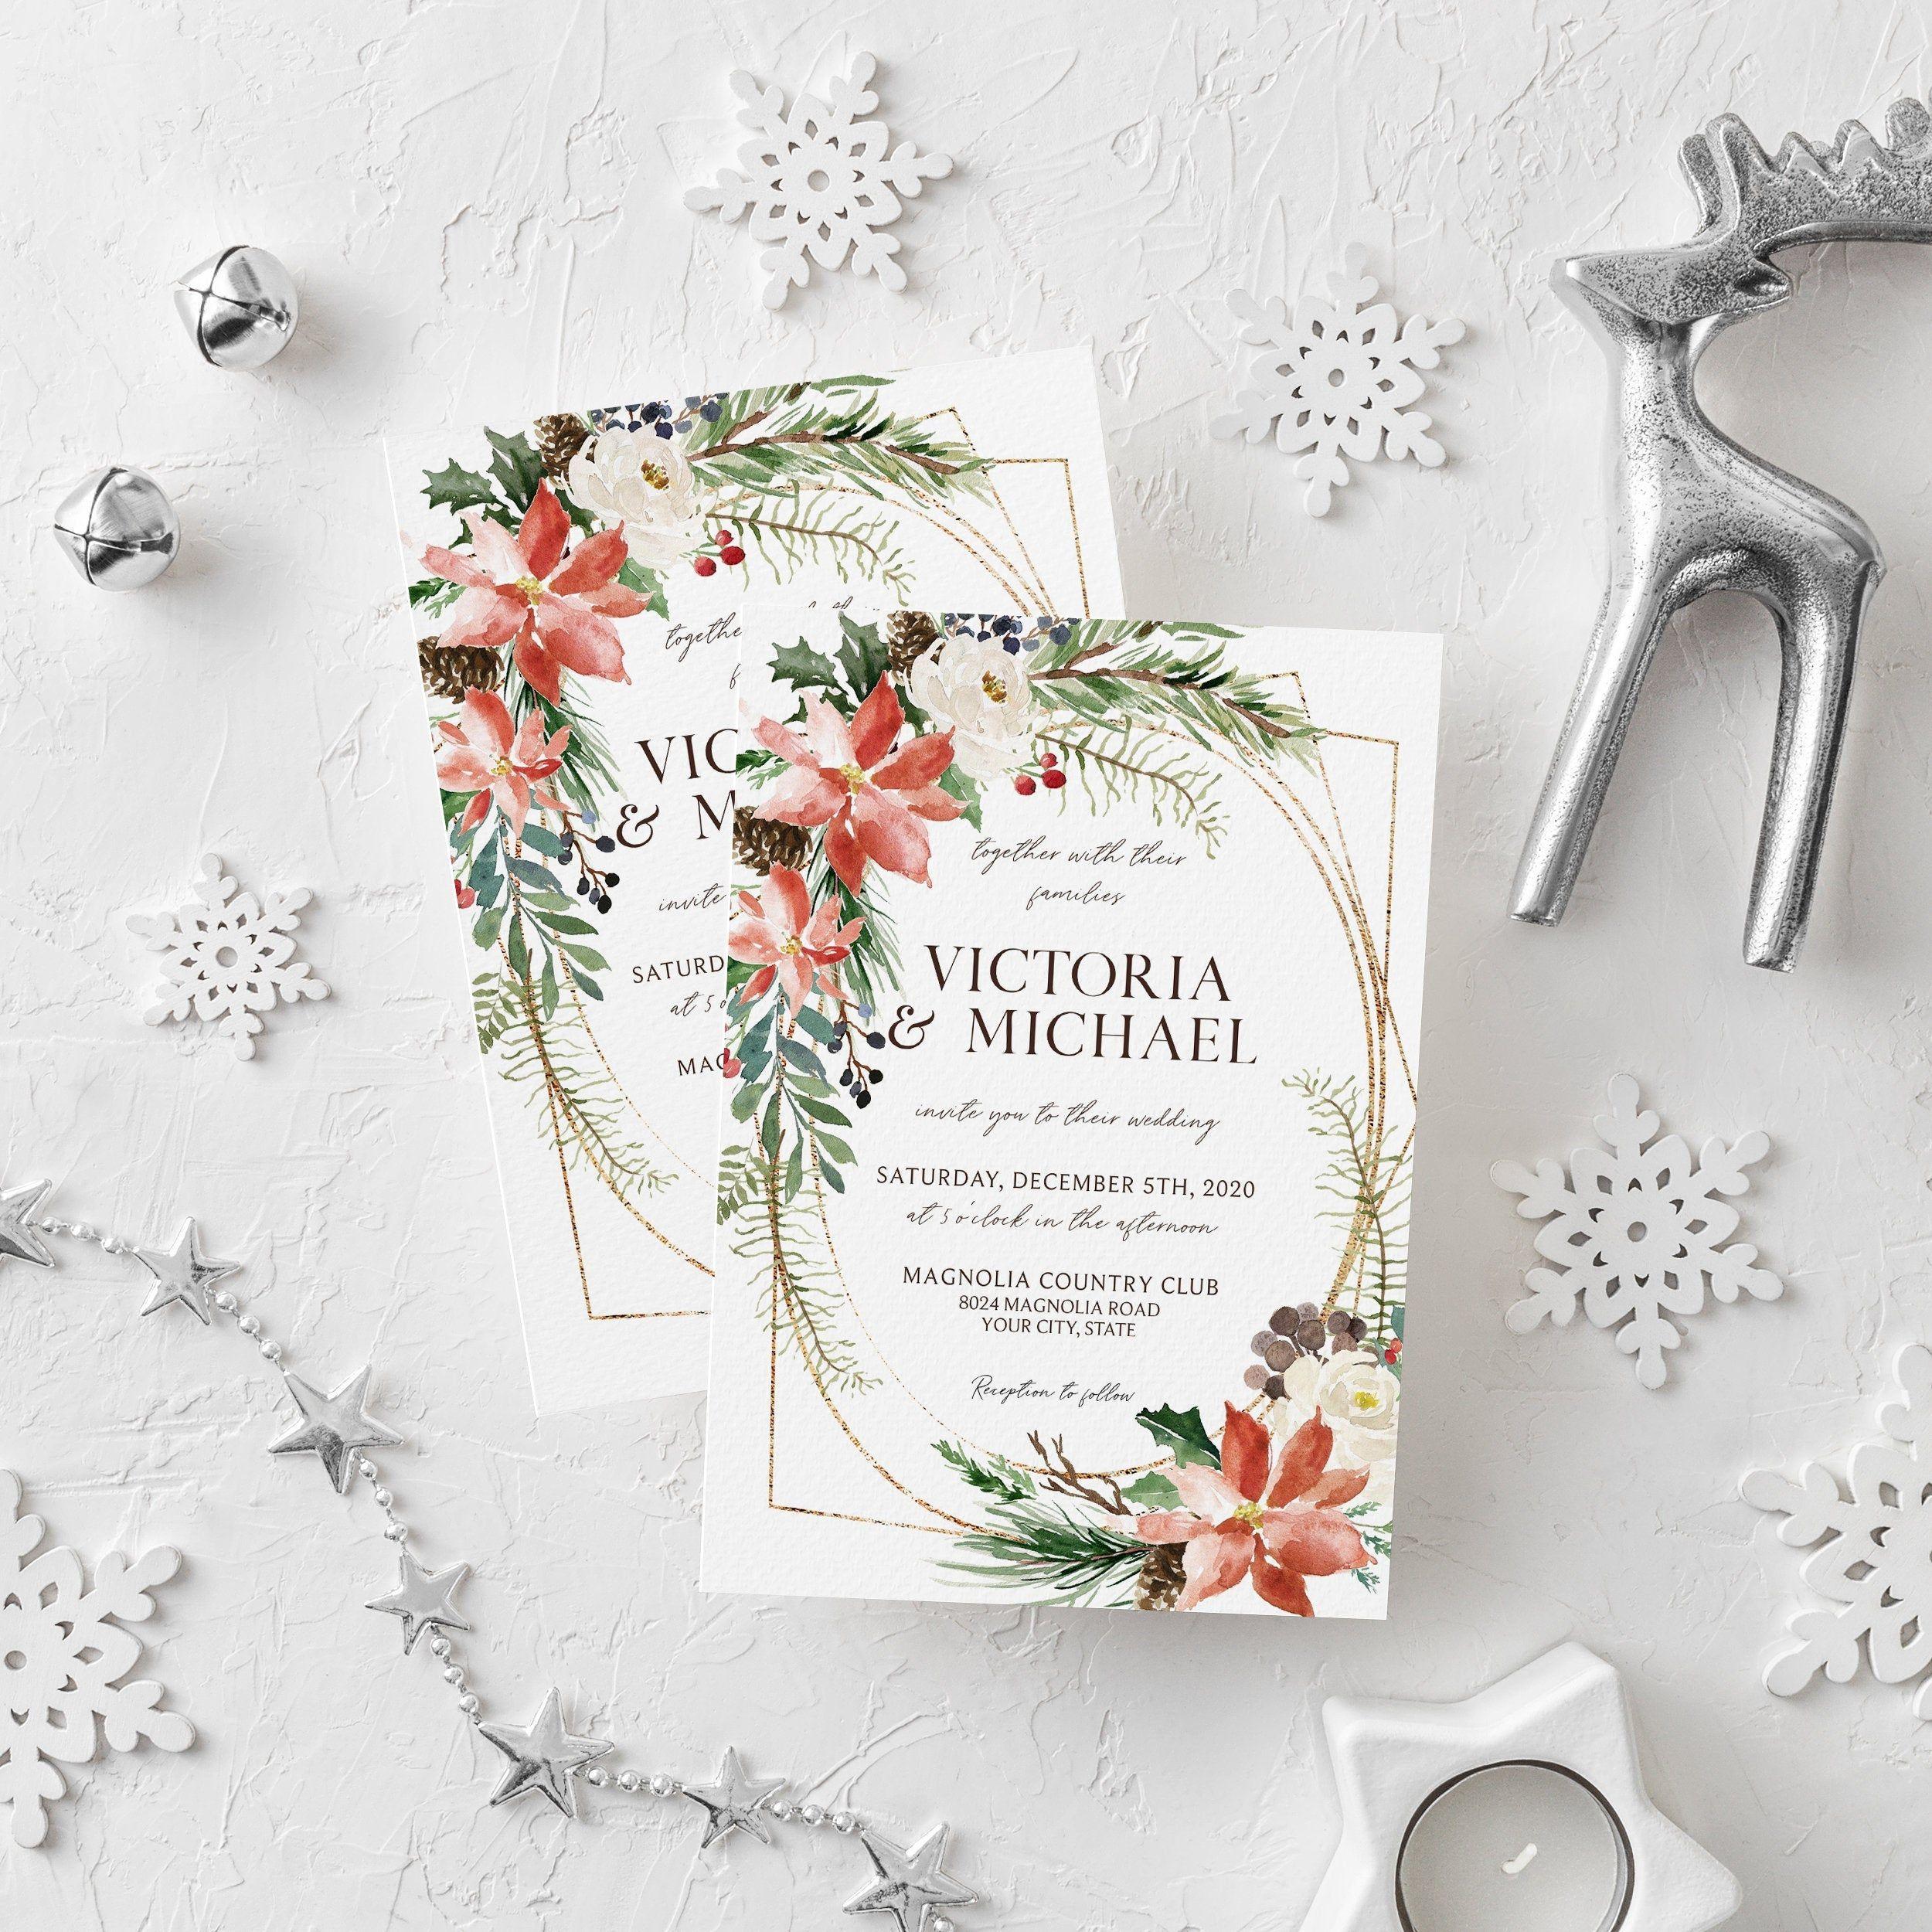 Christmas wedding invitations canada